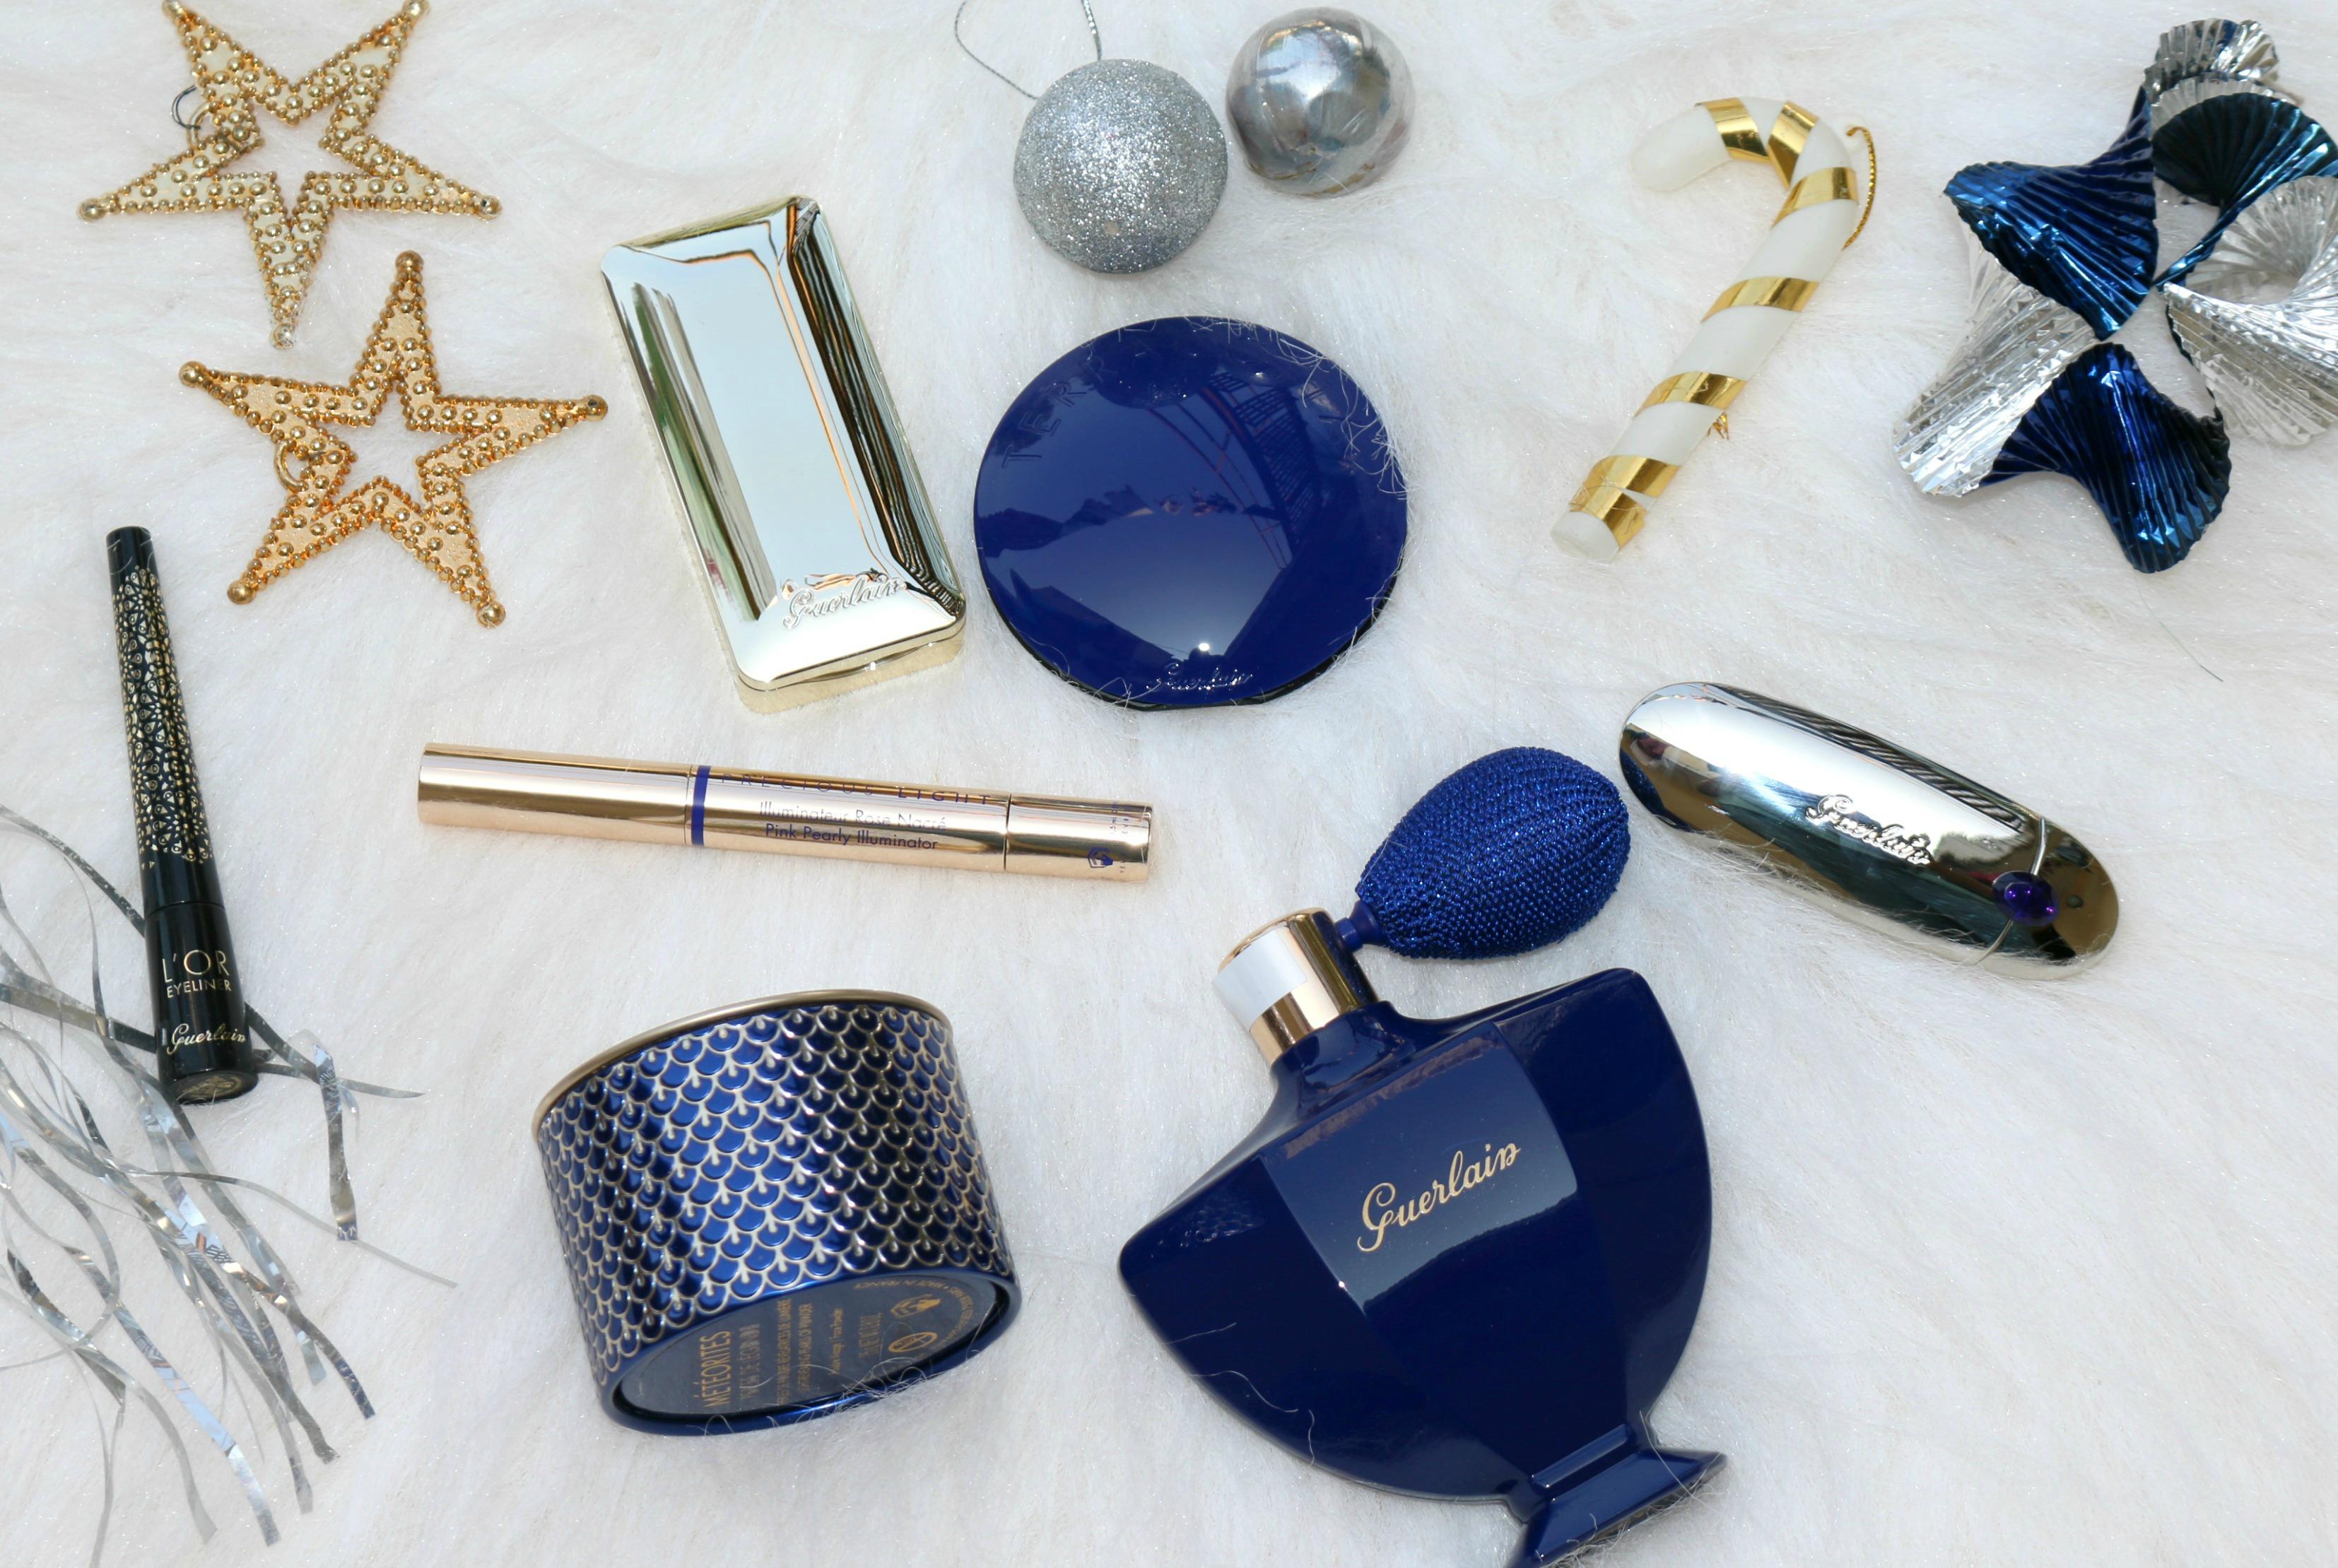 guerlain shalimar holiday 2016 makeup collection